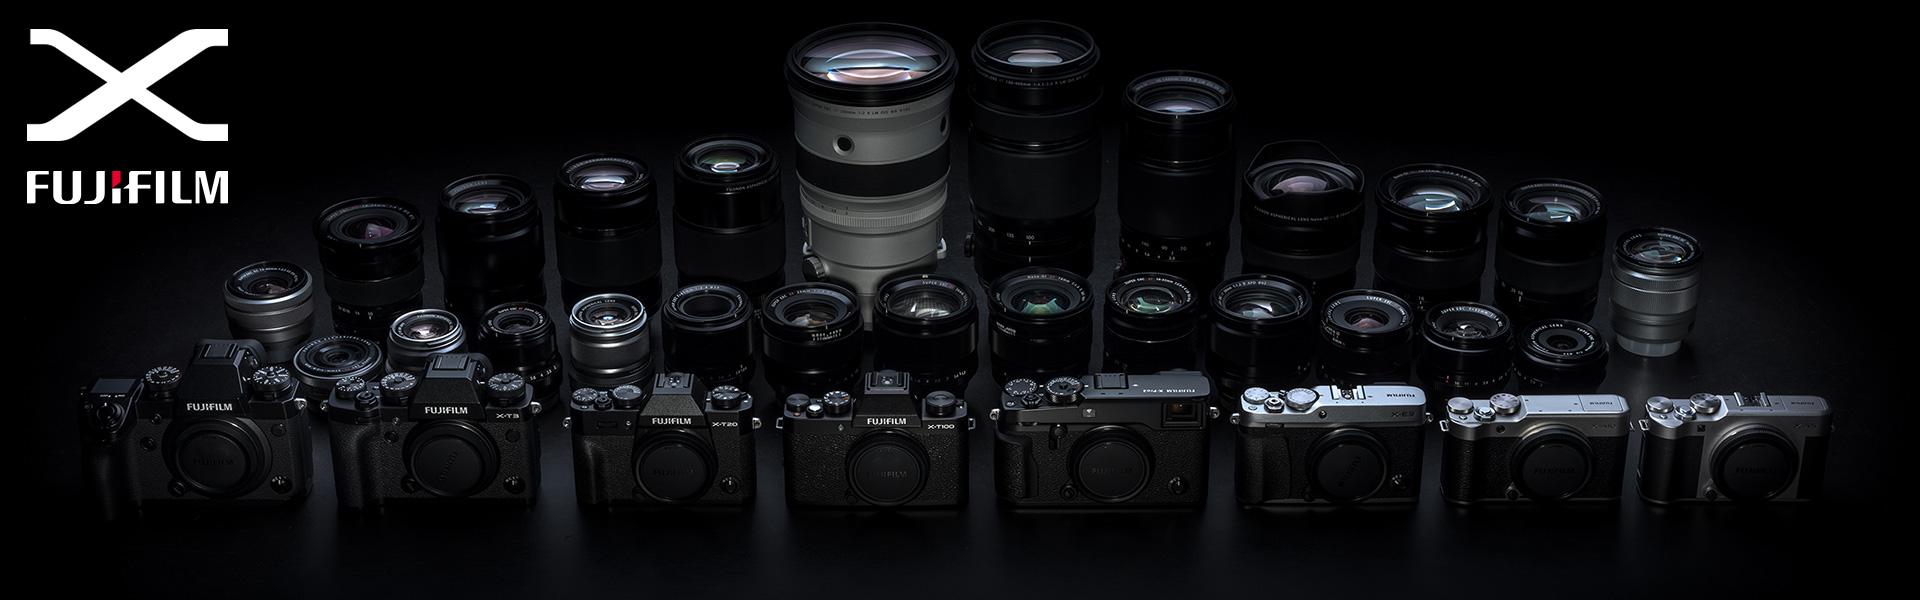 [photo] Assorted Fujifilm X system digital cameras and lenses